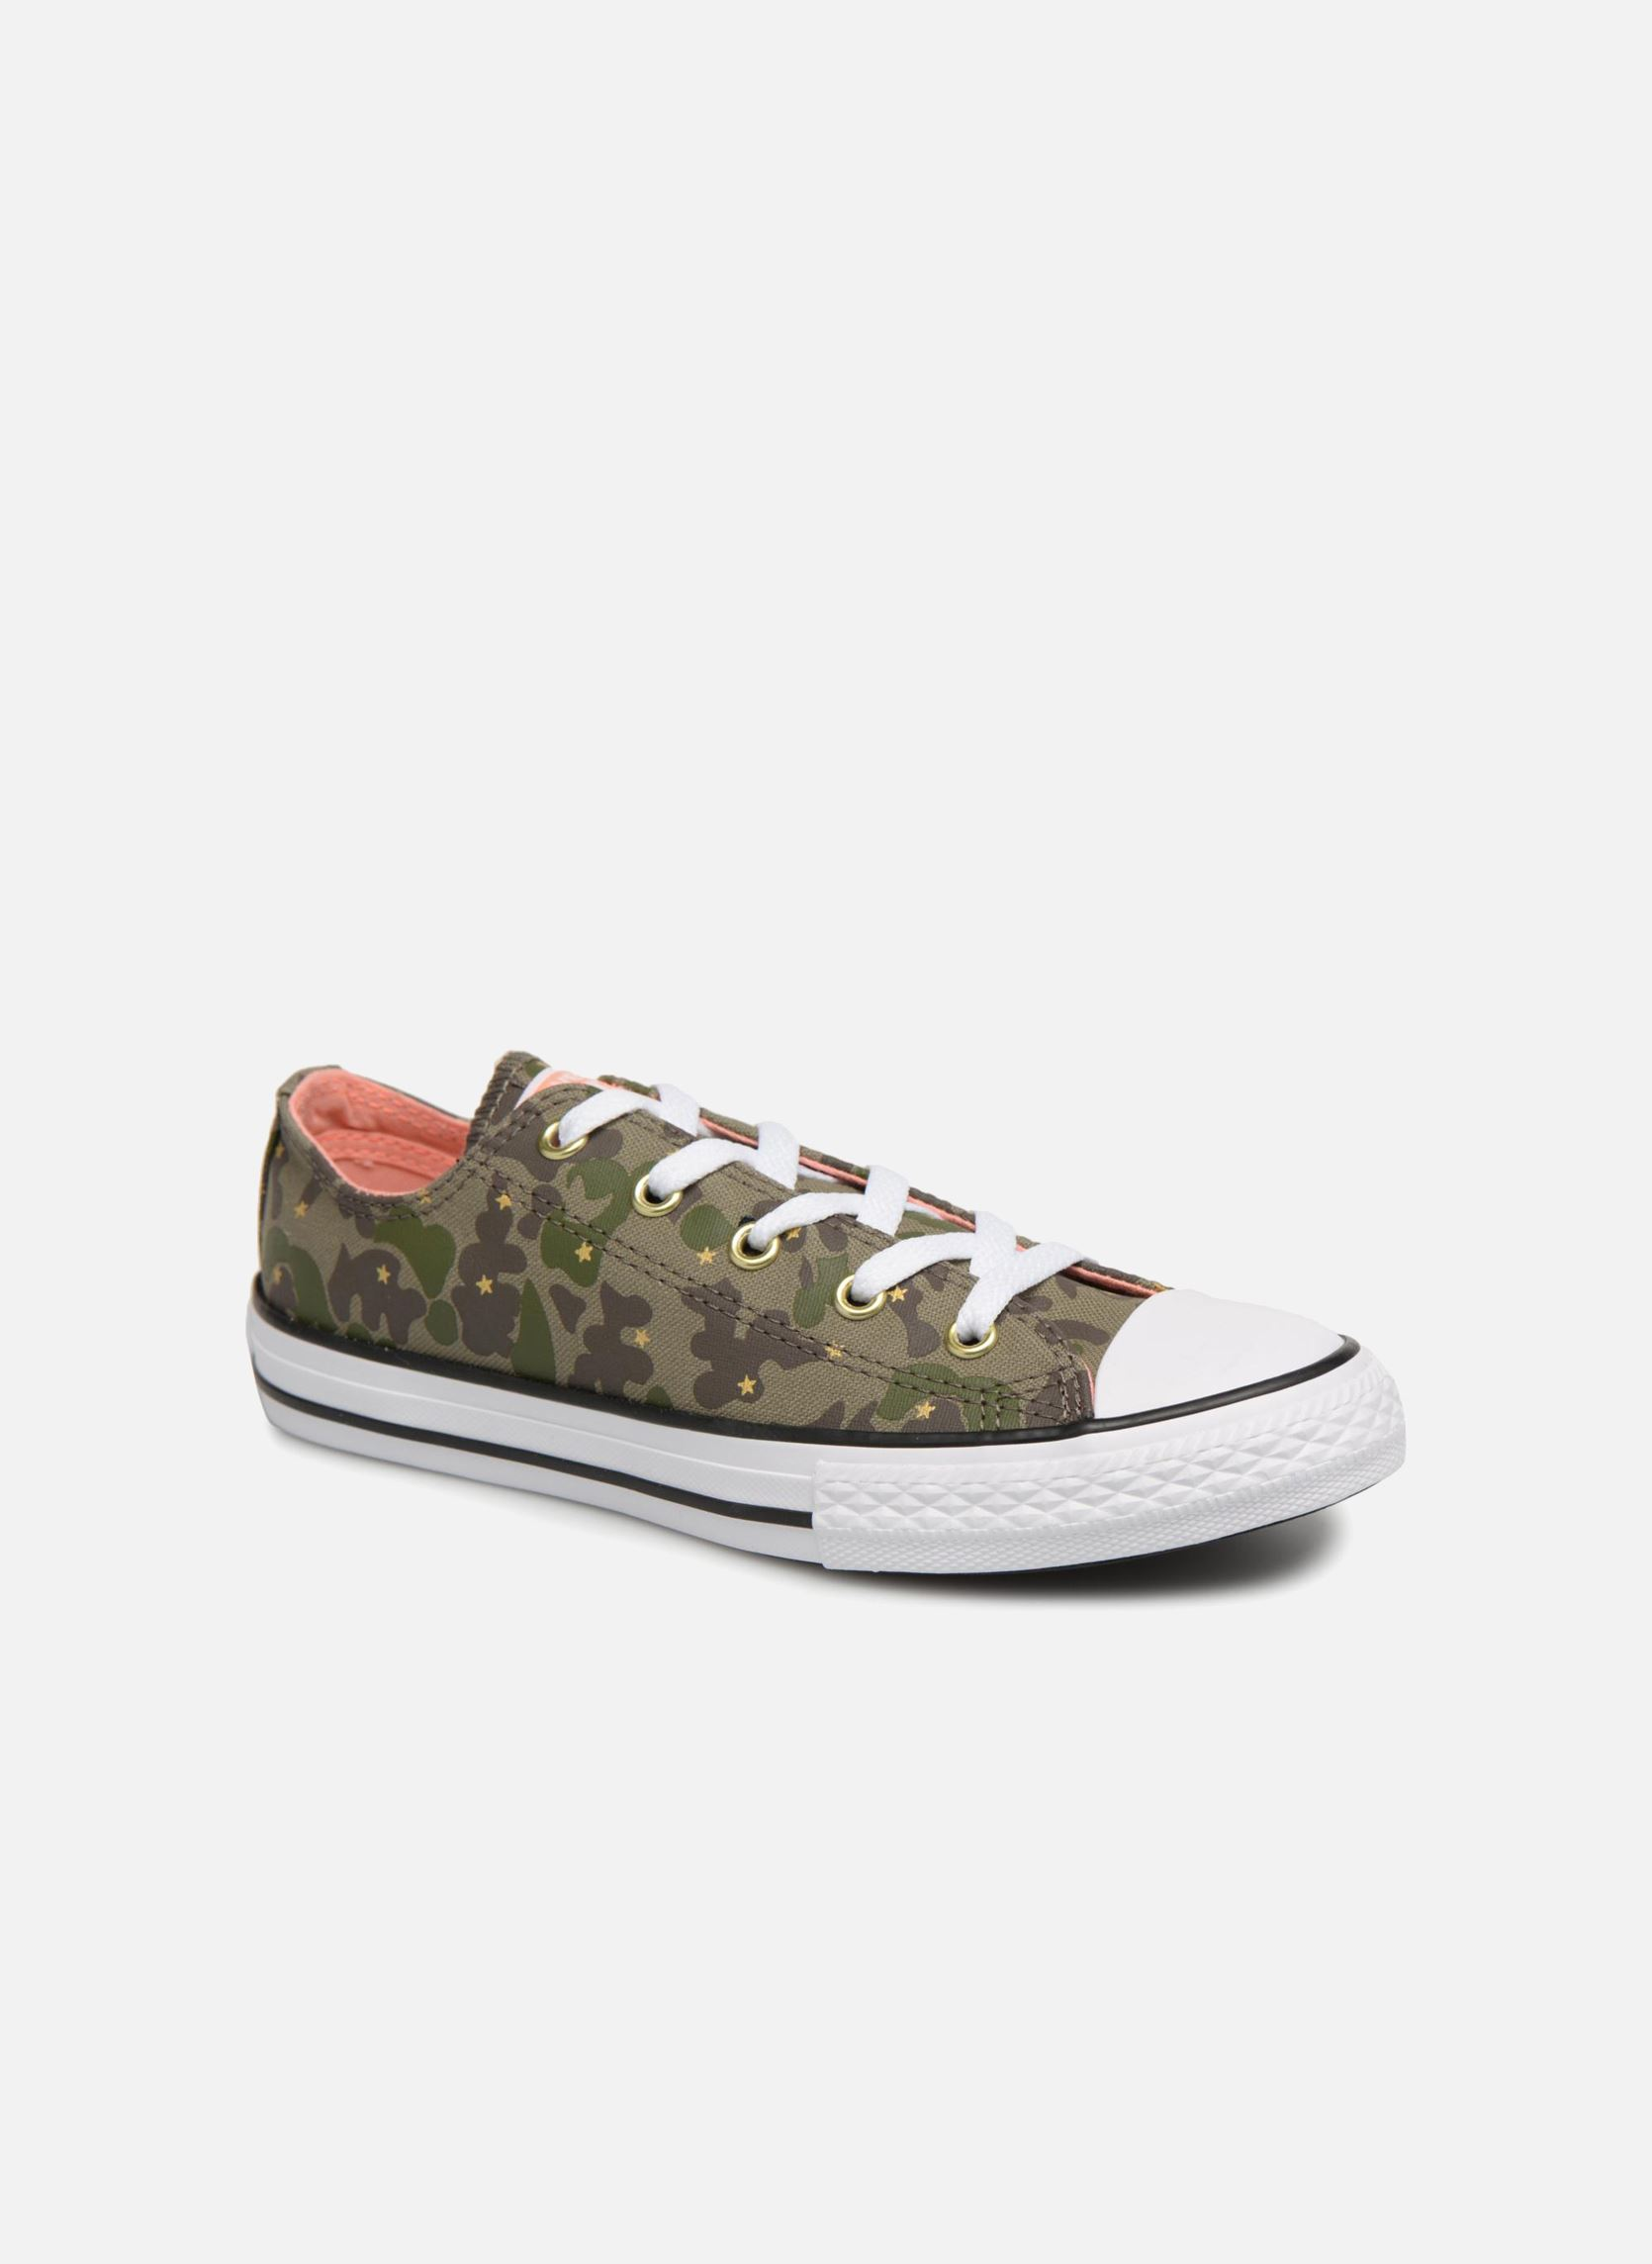 converse chaussures bruxelles